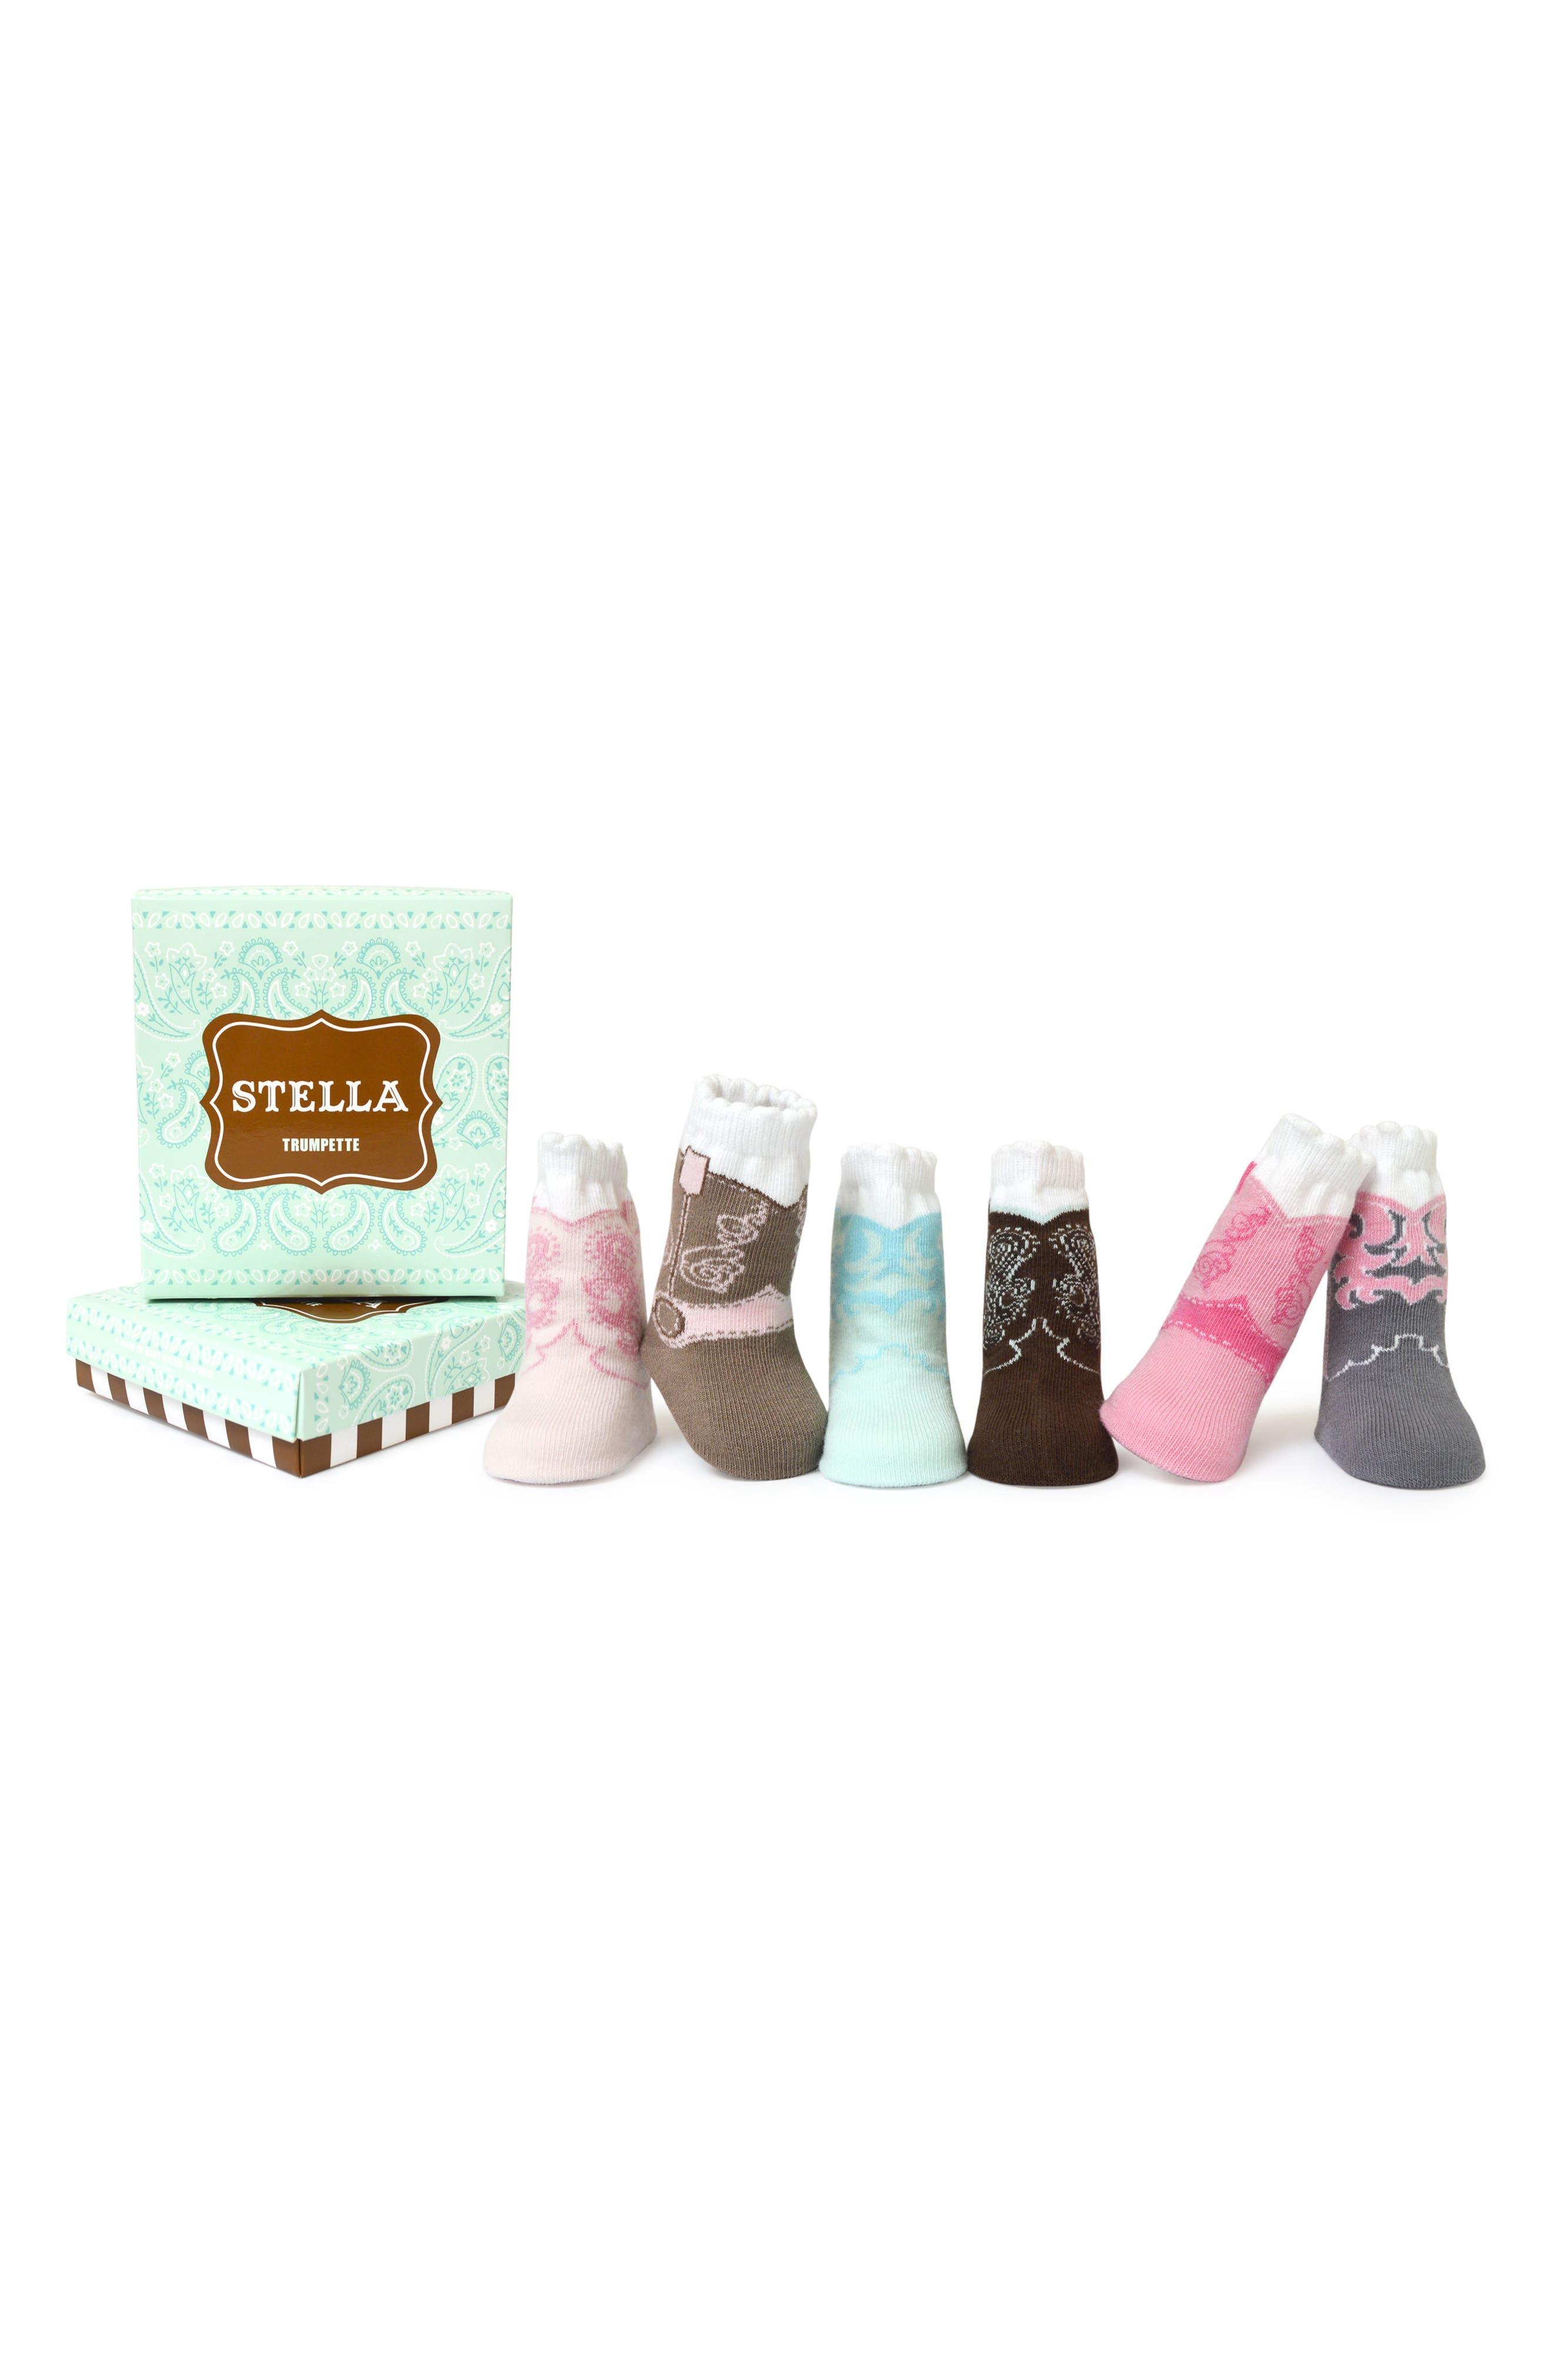 Stella 6-Pack Socks,                             Main thumbnail 1, color,                             650